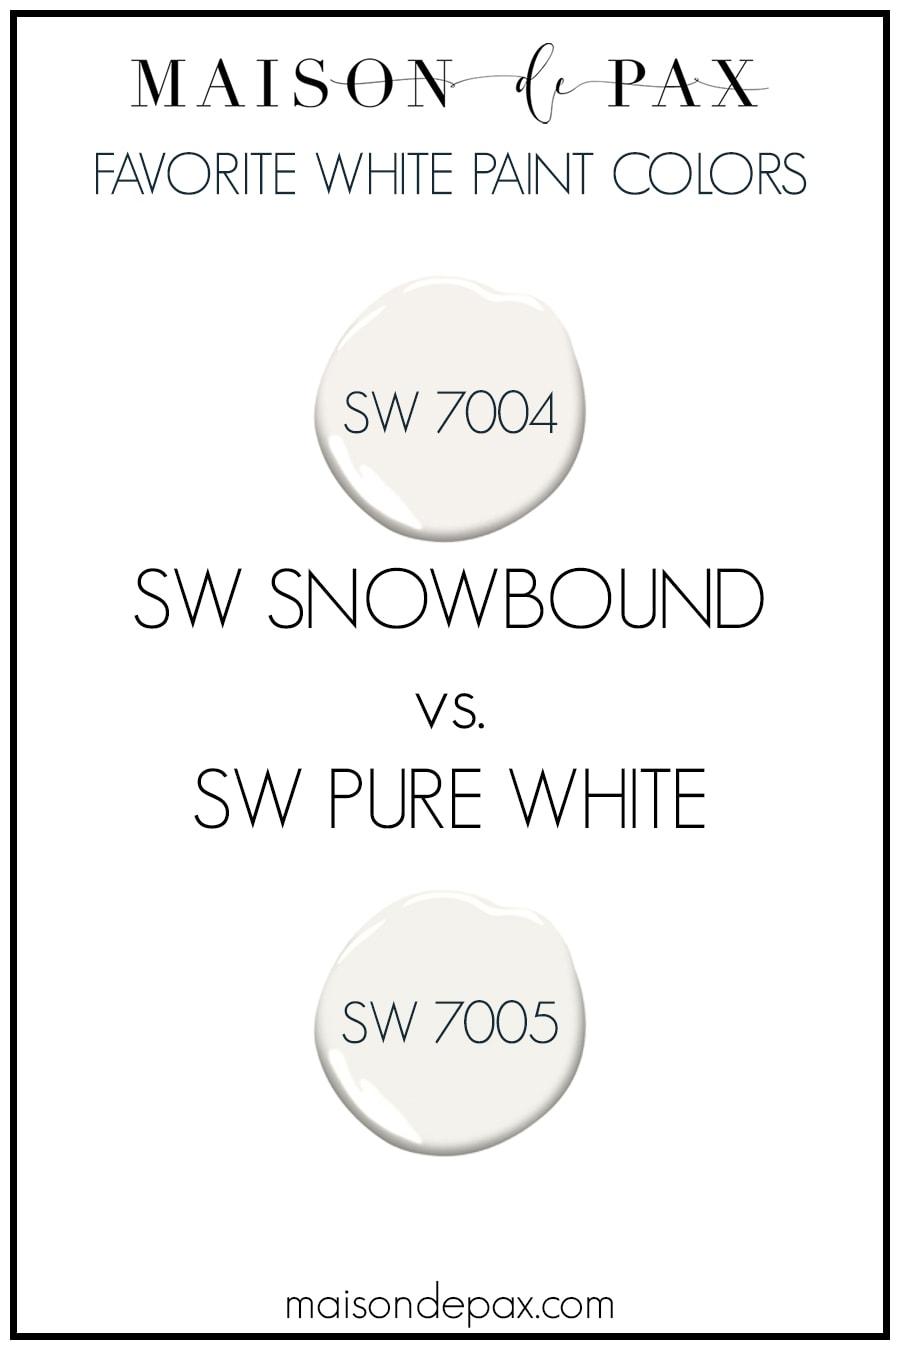 SW Snowbound 7004 vs SW Pure White 7005